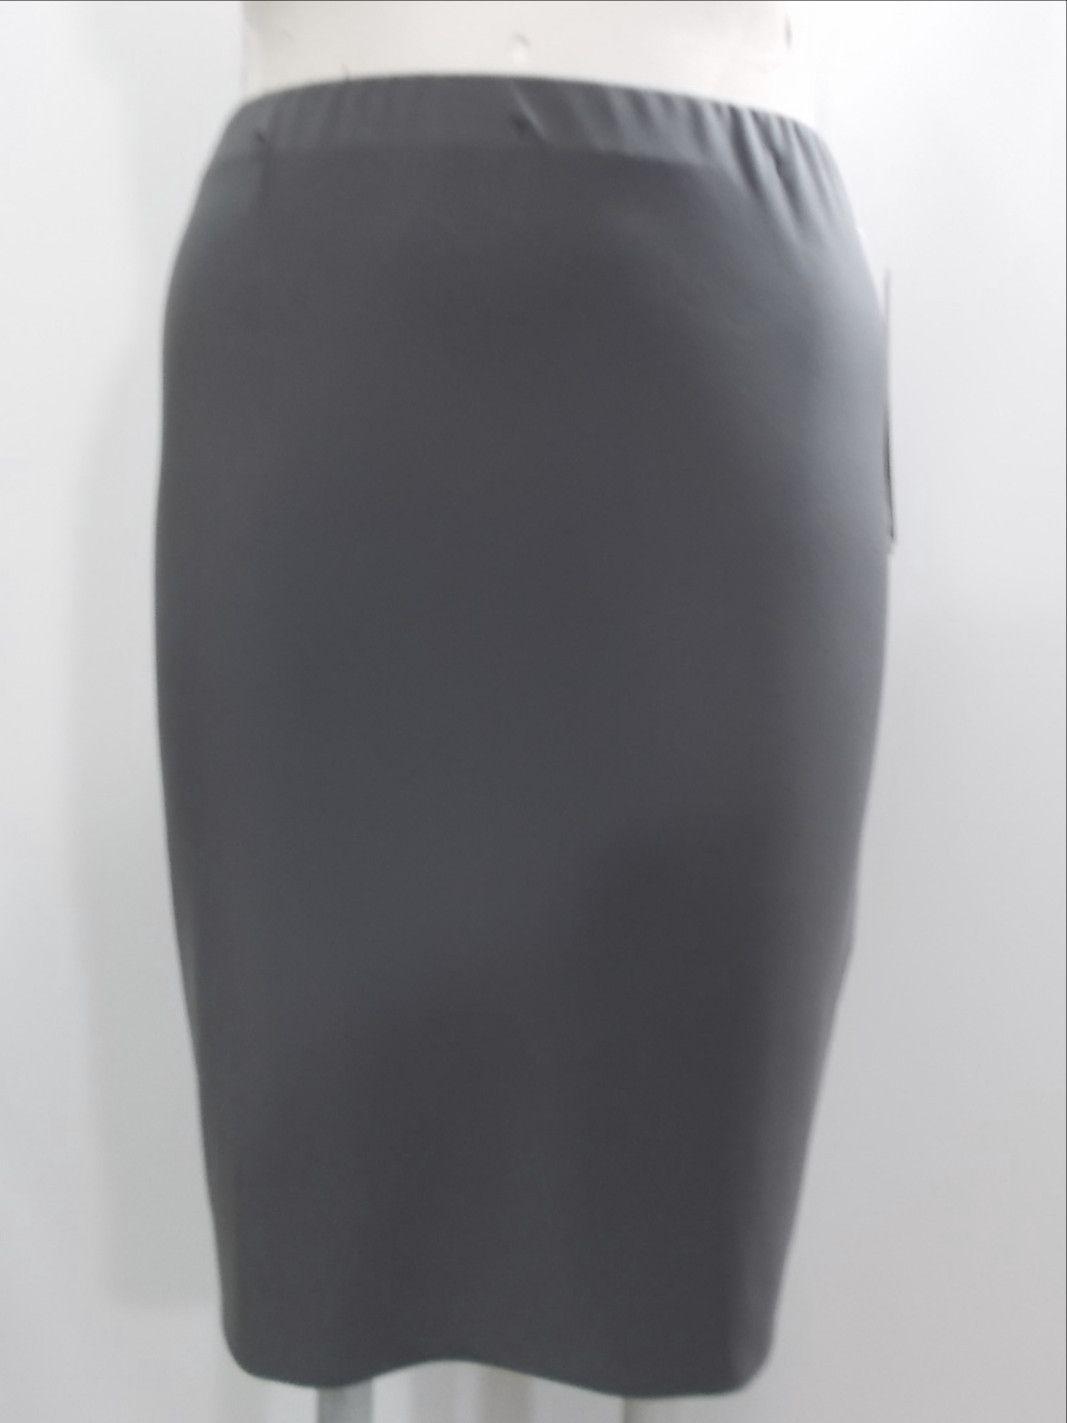 b47f08cdc40 Sympli - Travel Knit Titanium Short Tube Skirt Skirts